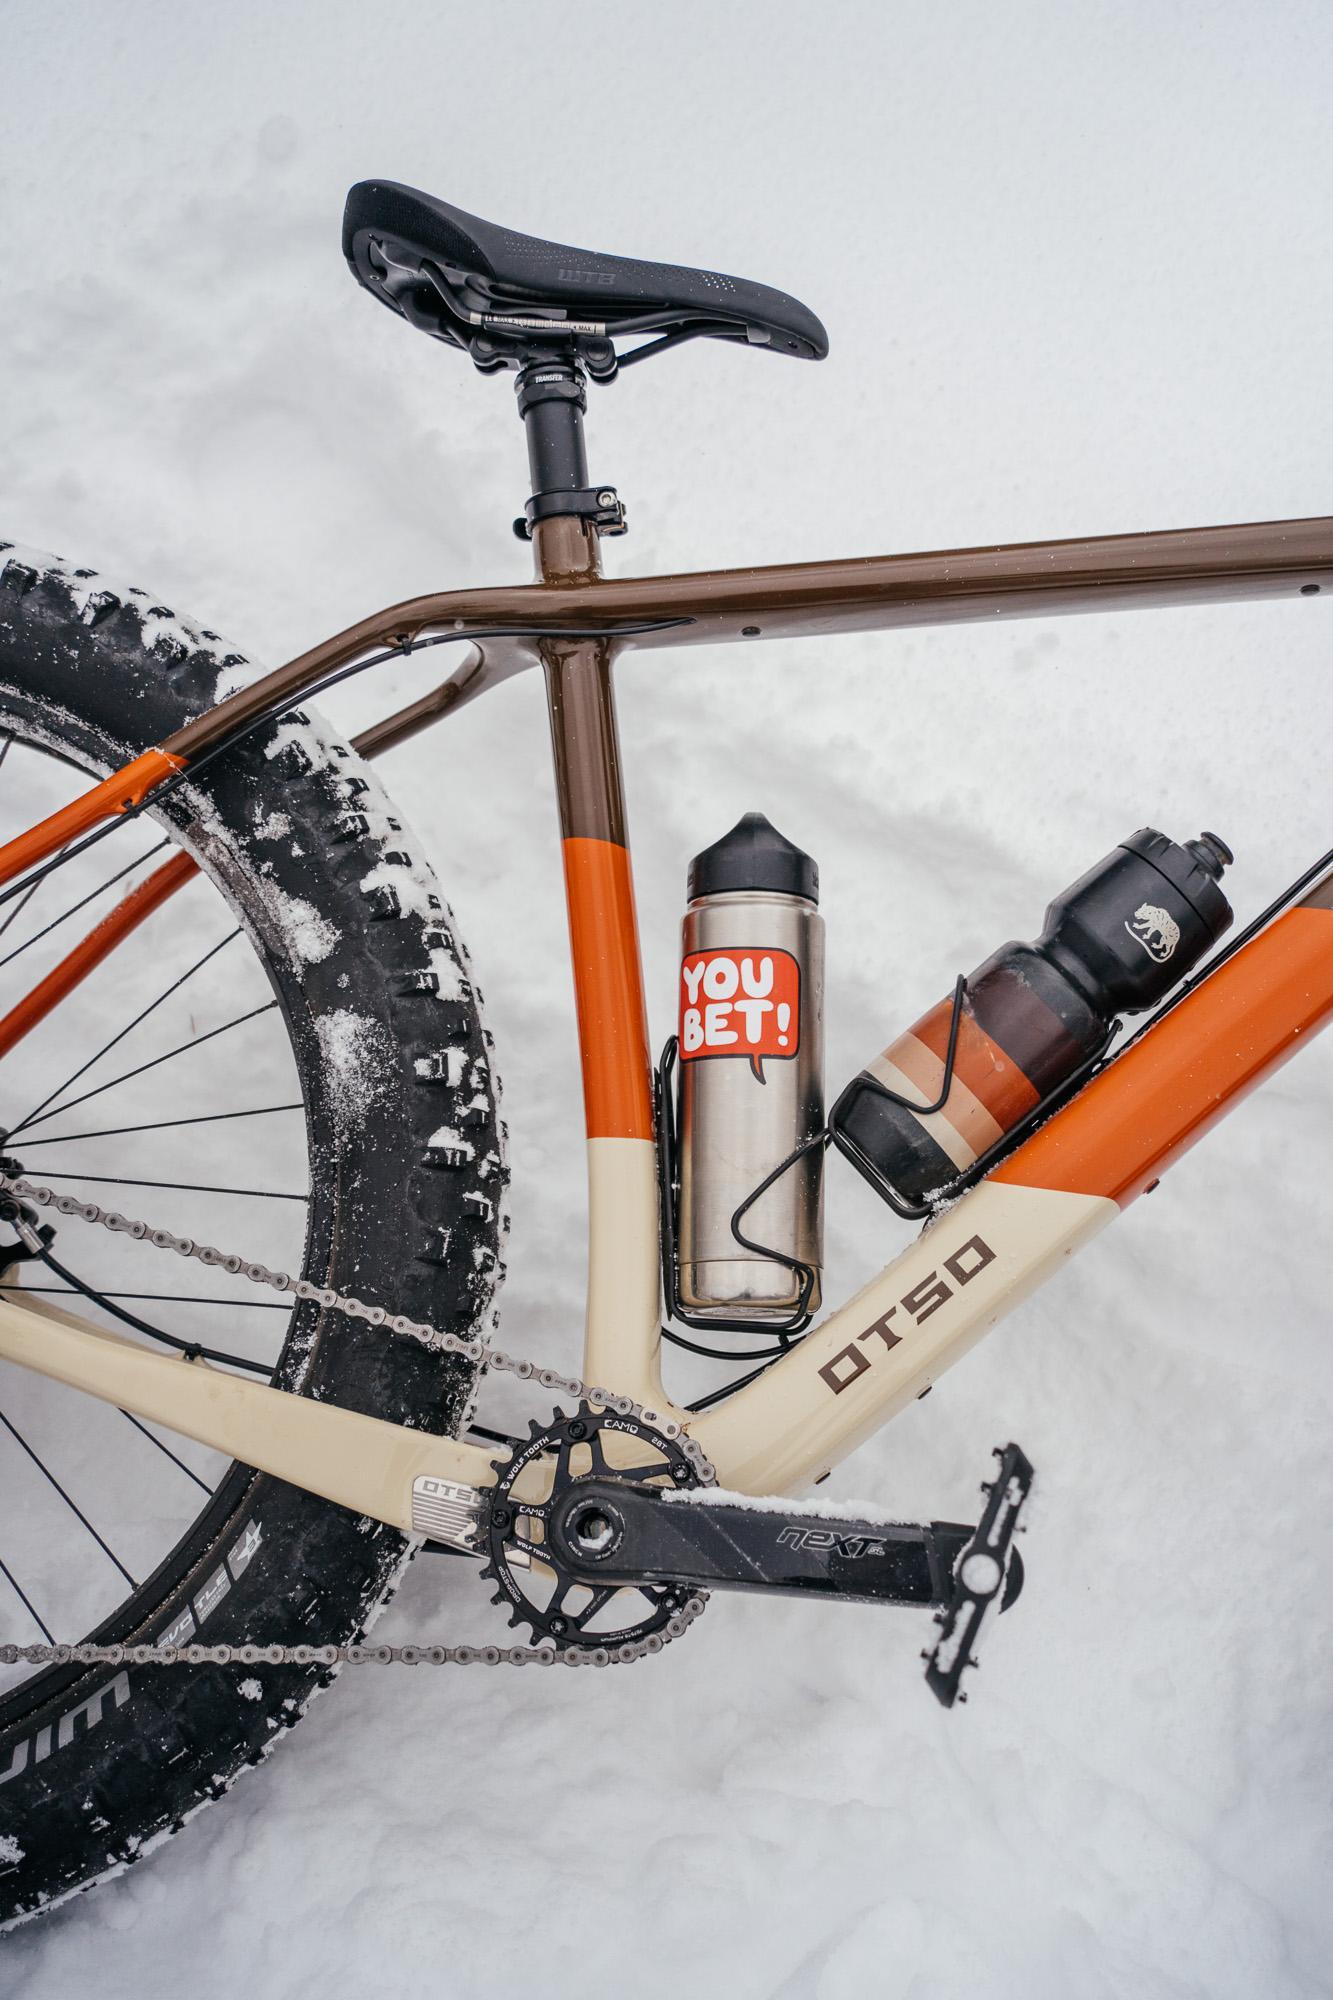 My bike matches my bottle